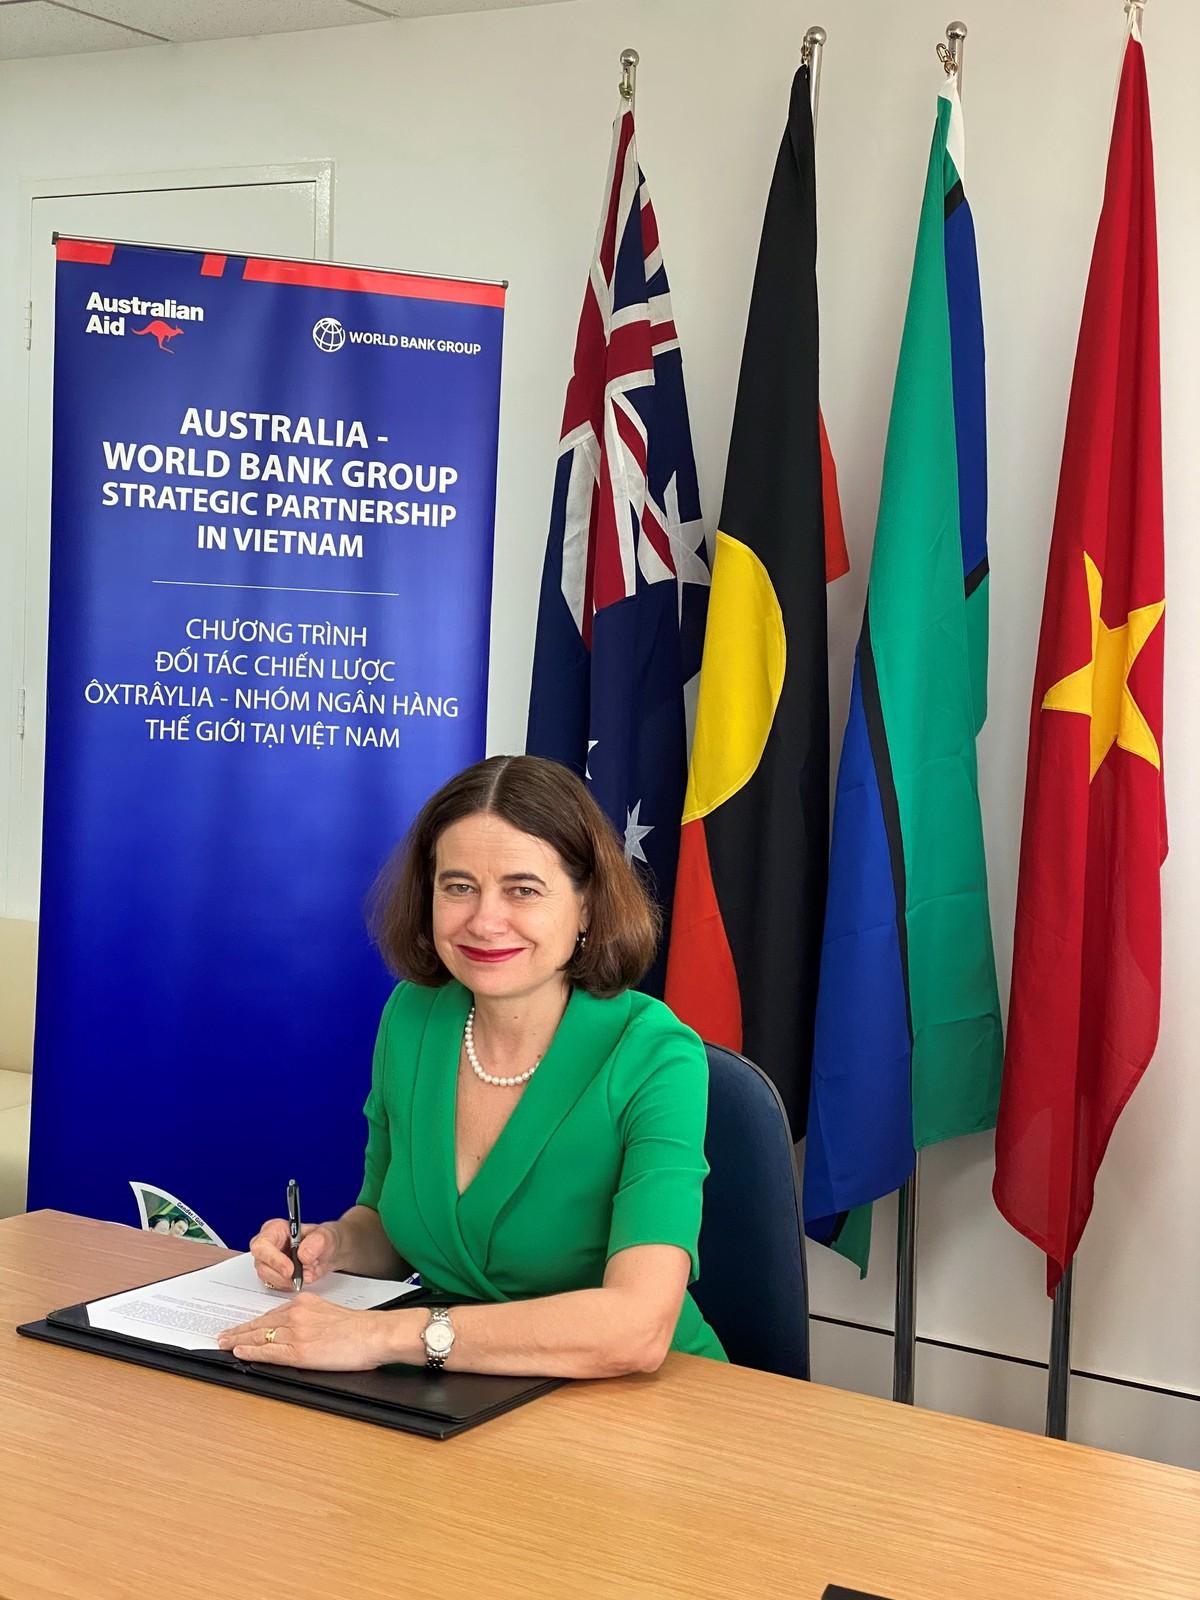 Vietnam's Development Agenda Receives Additional Boost by Australia, World Bank Group